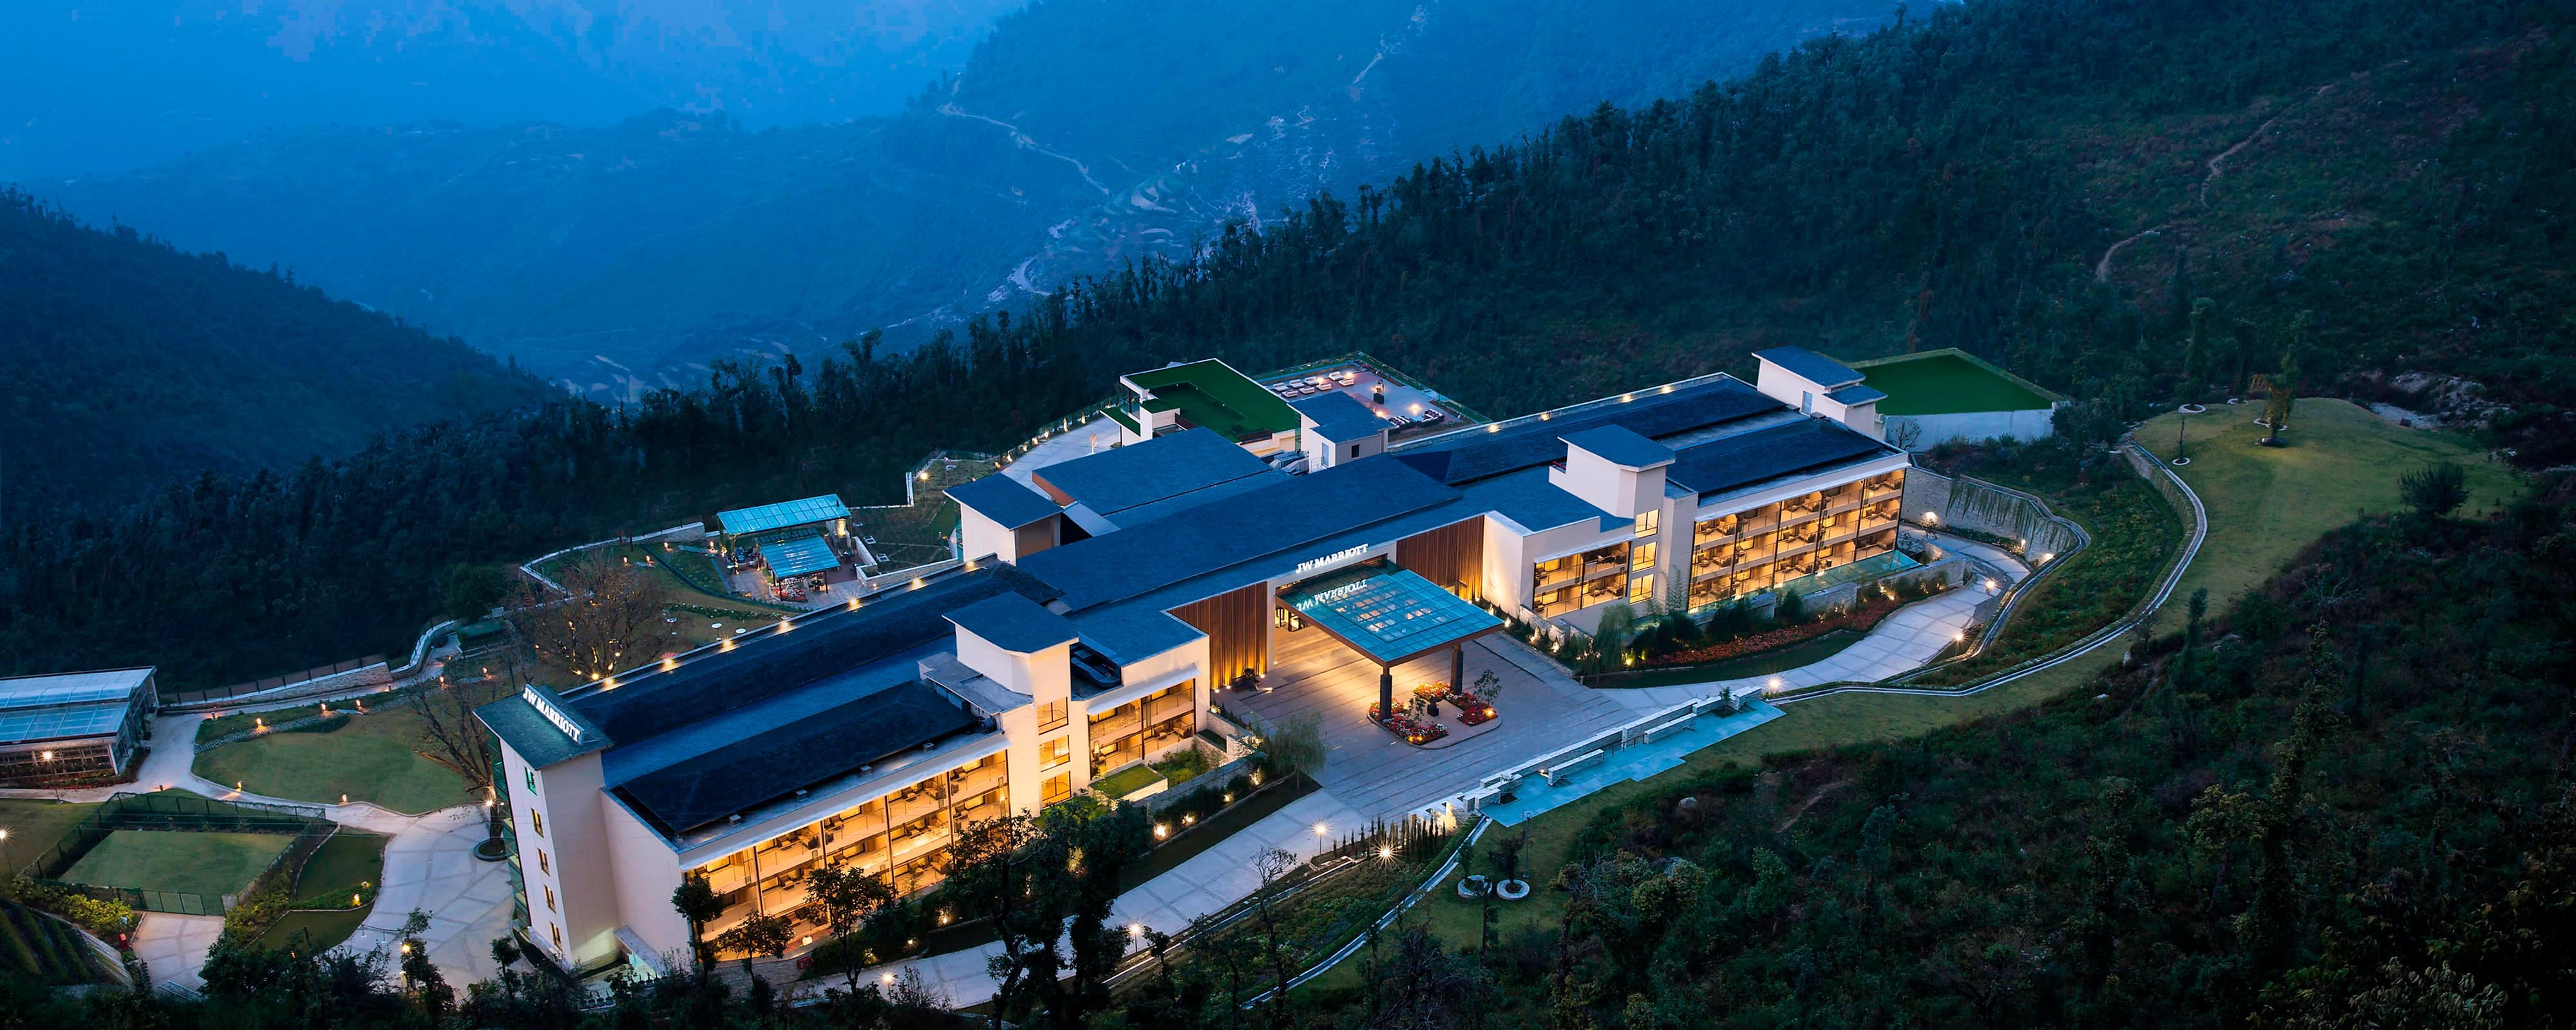 5Star Hotel in Mussoorie  JW Marriott Mussoorie Walnut Grove Resort  Spa